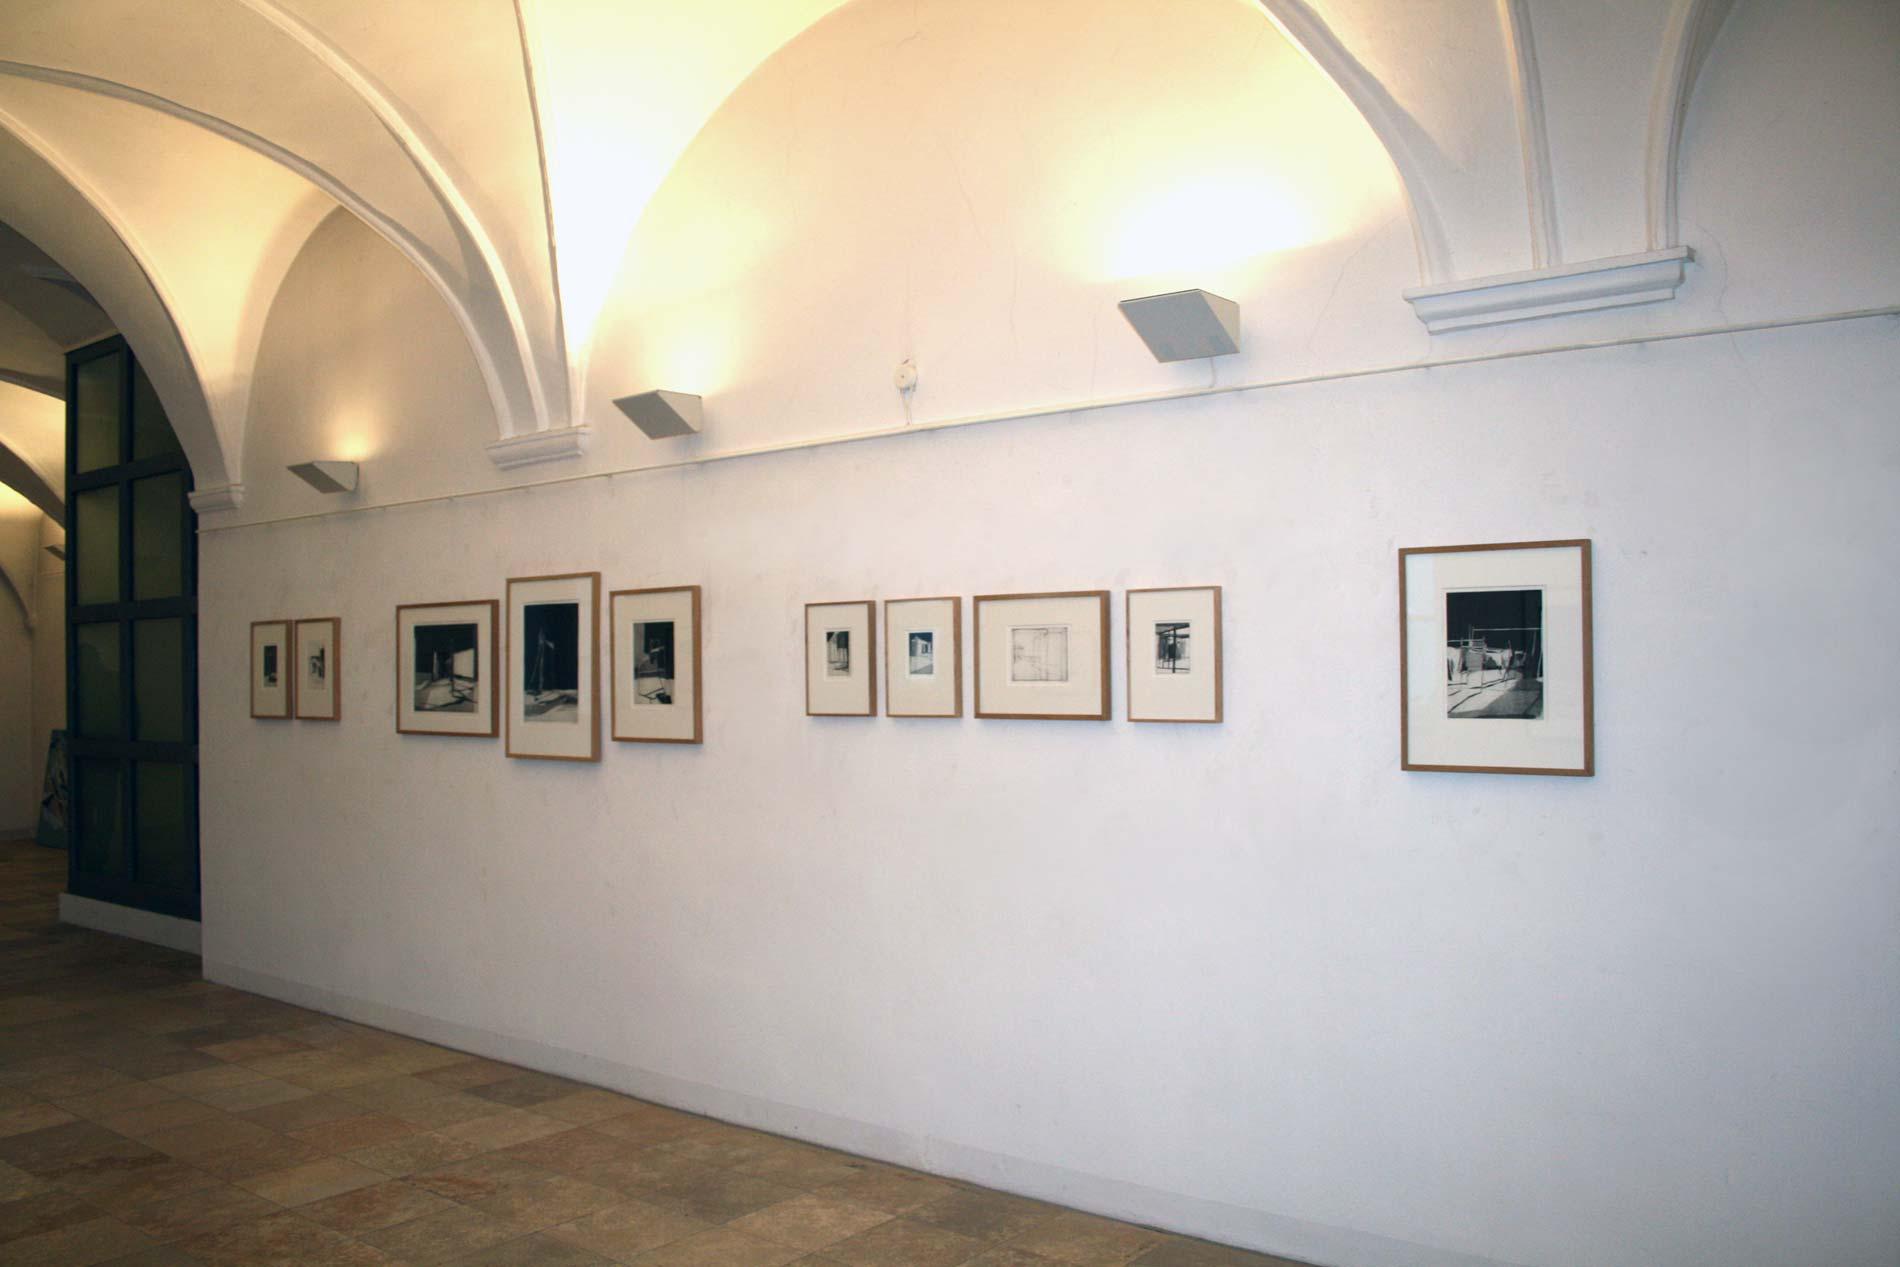 Exhibition URBEX 2018 Passau